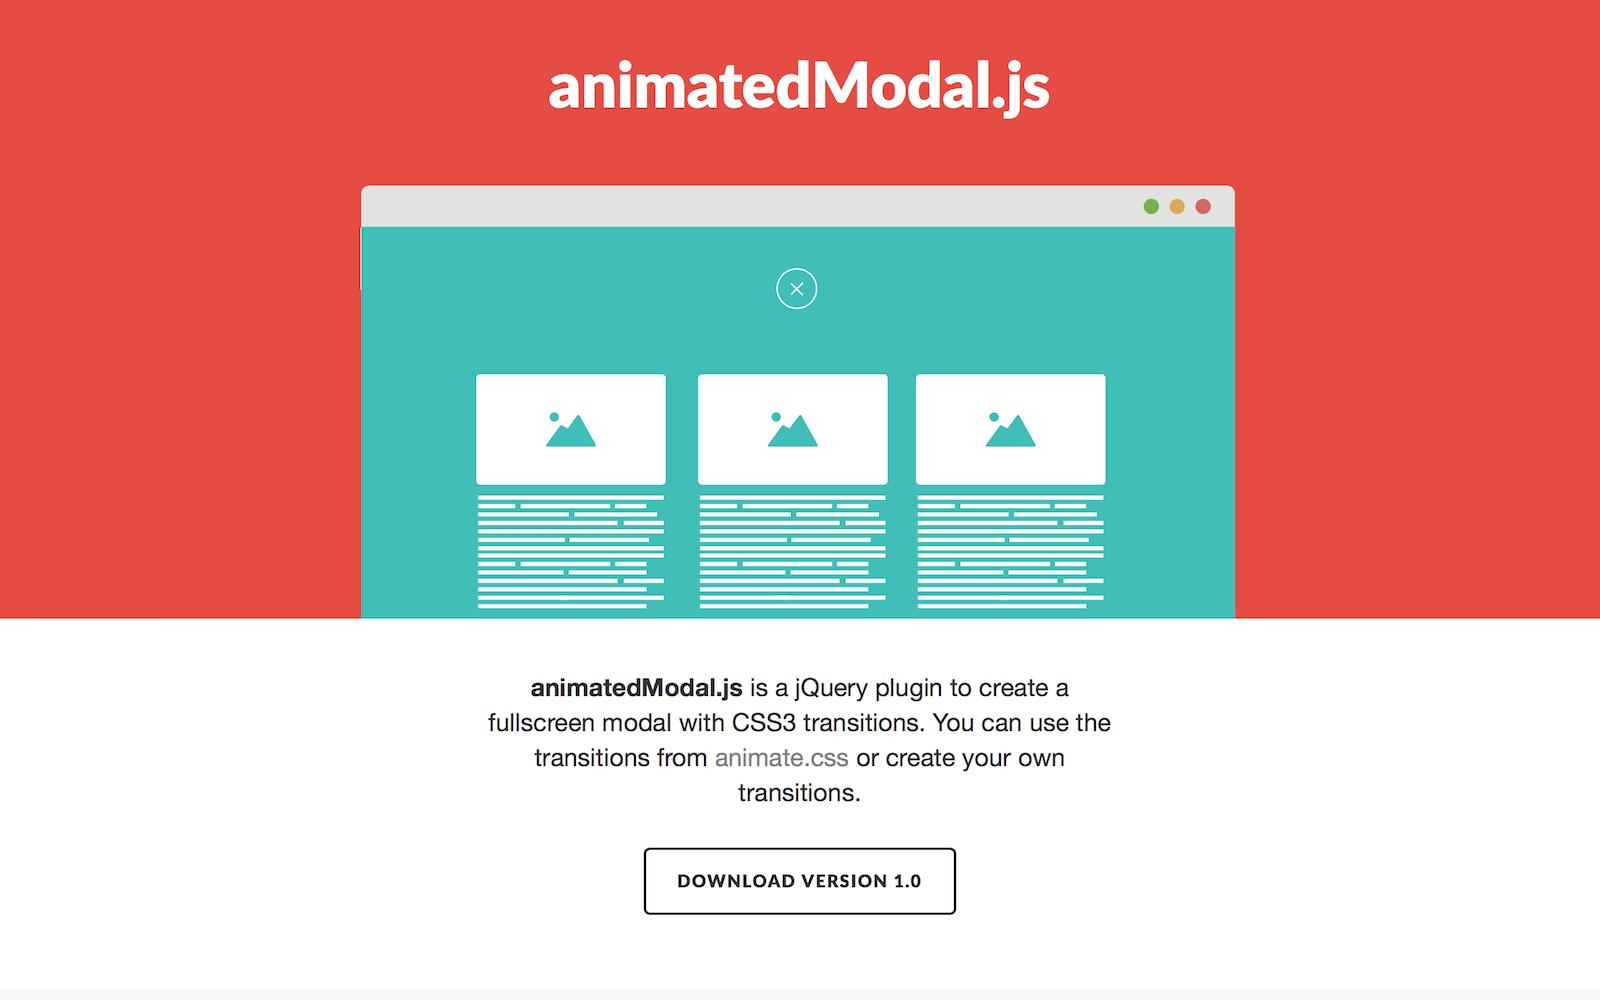 animatedModal.js